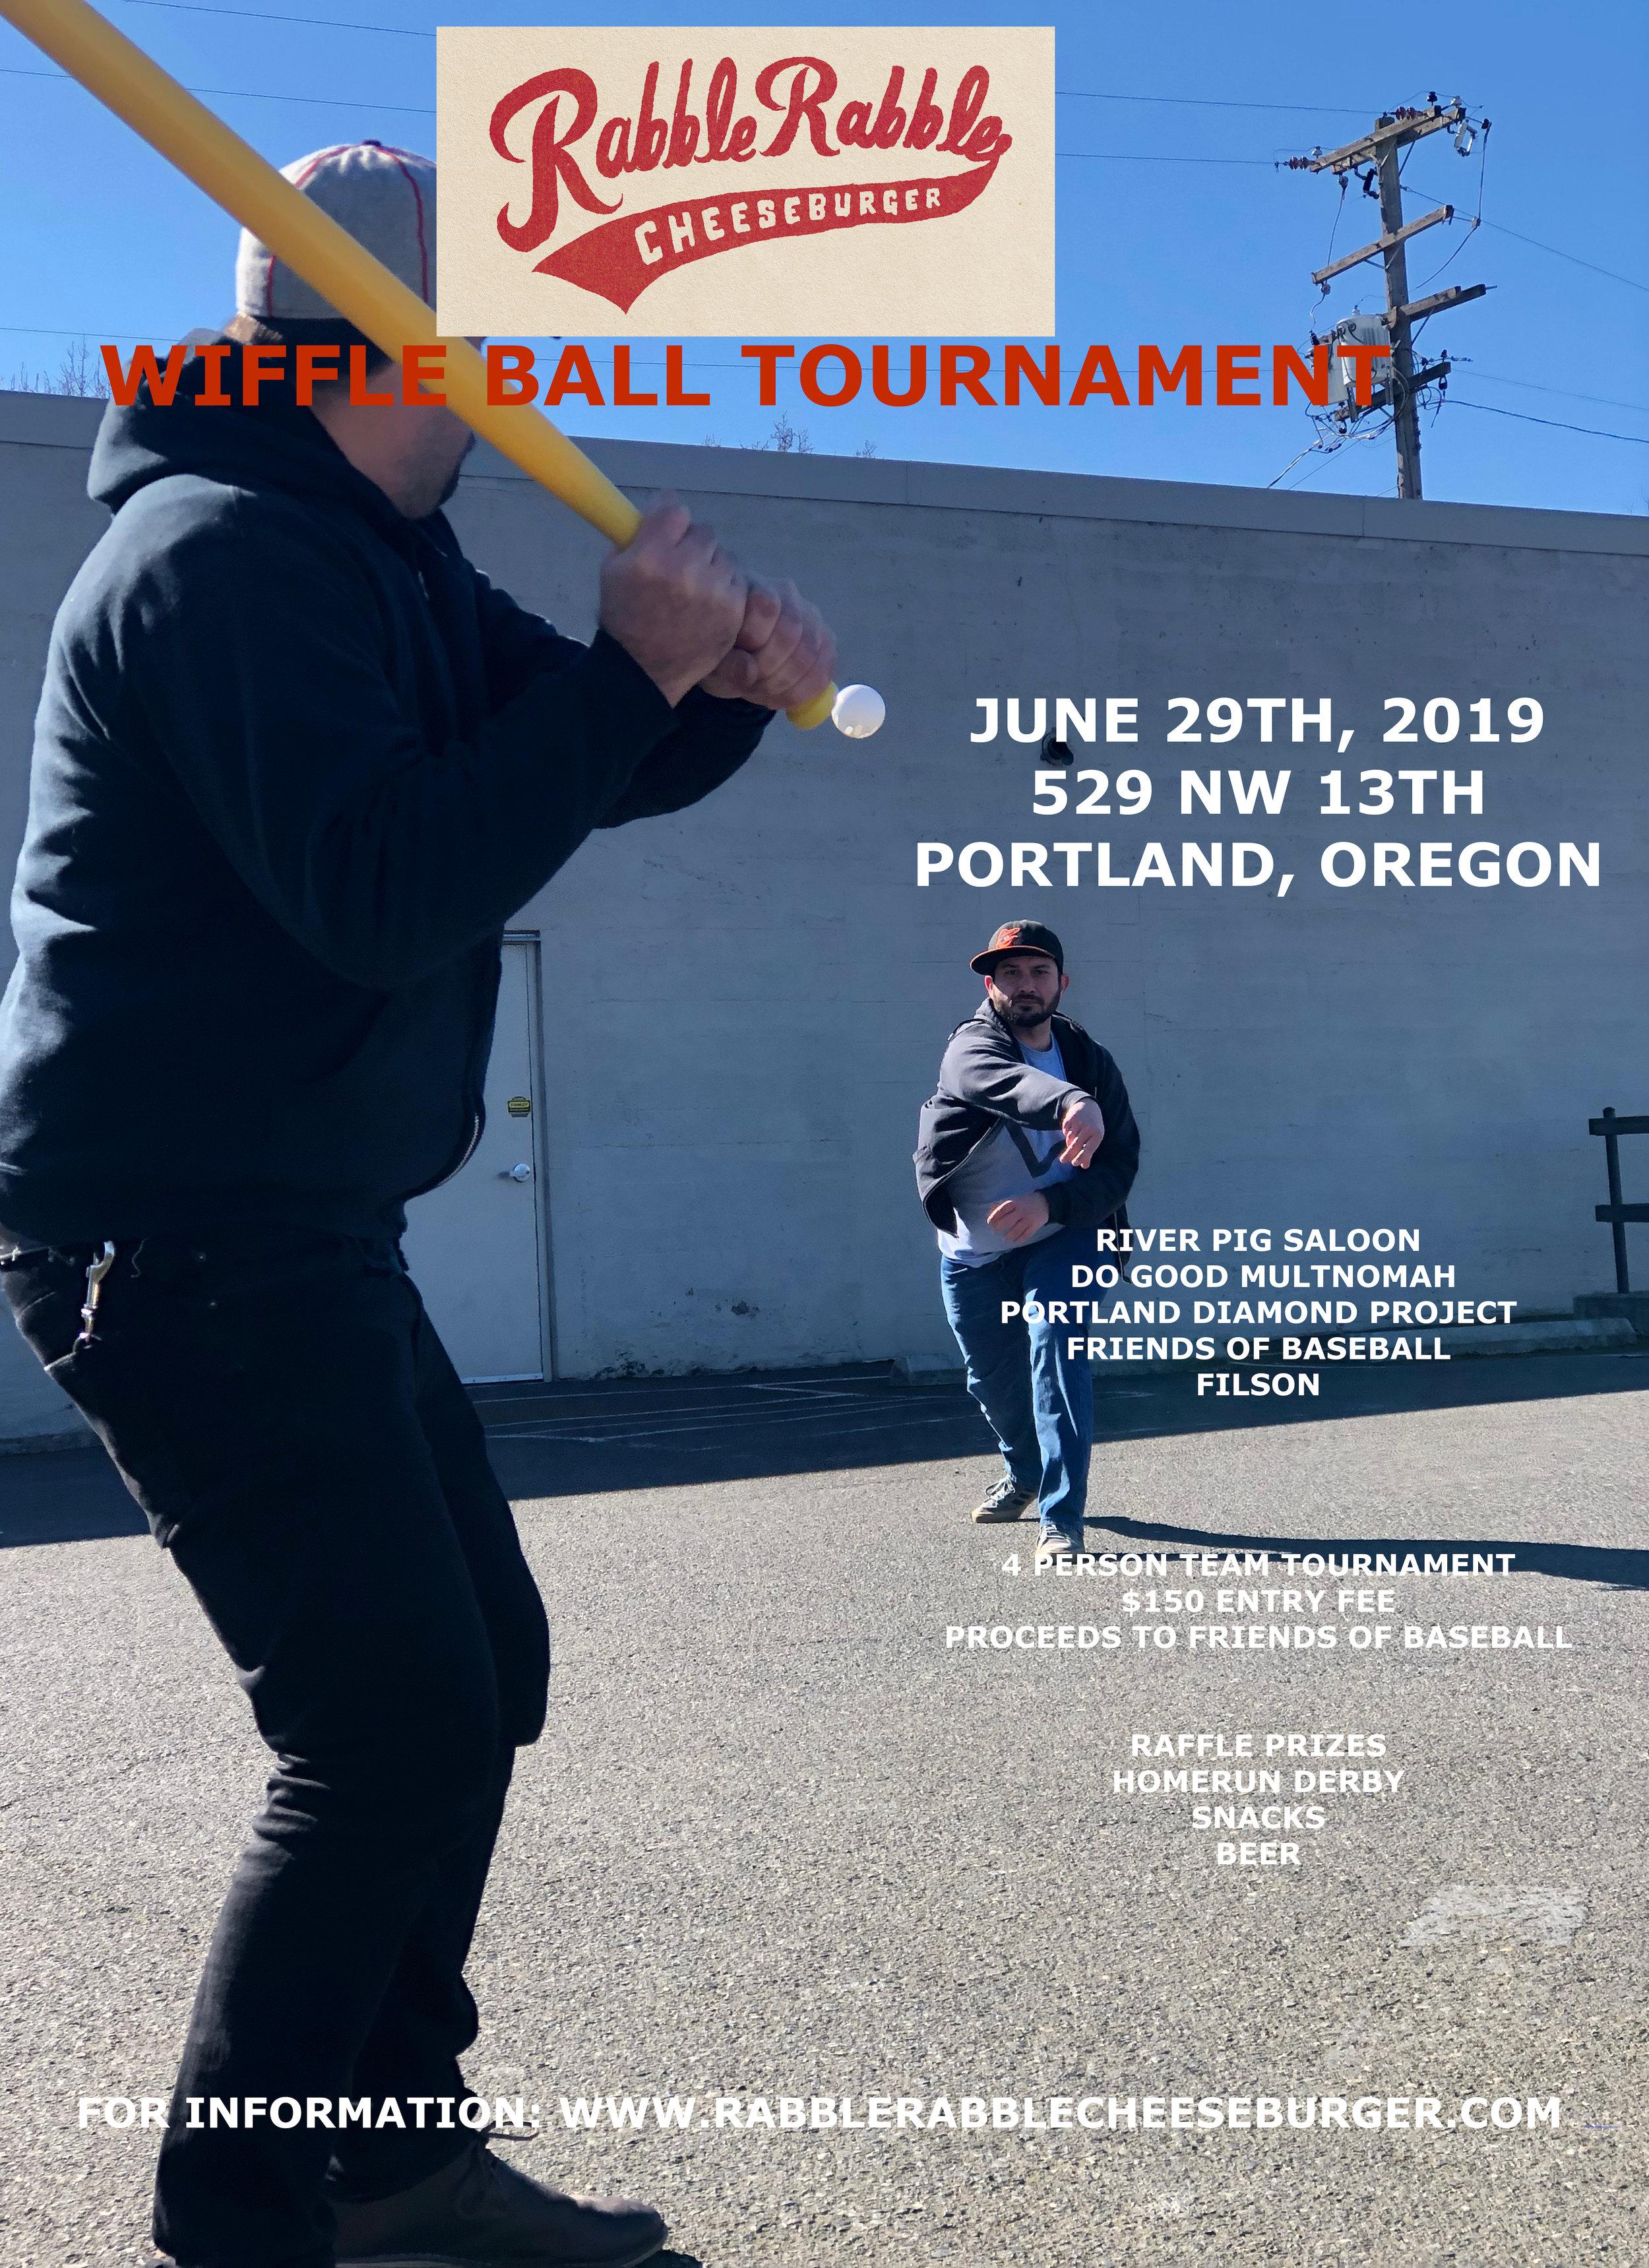 wiffle ball tourny poster.jpg